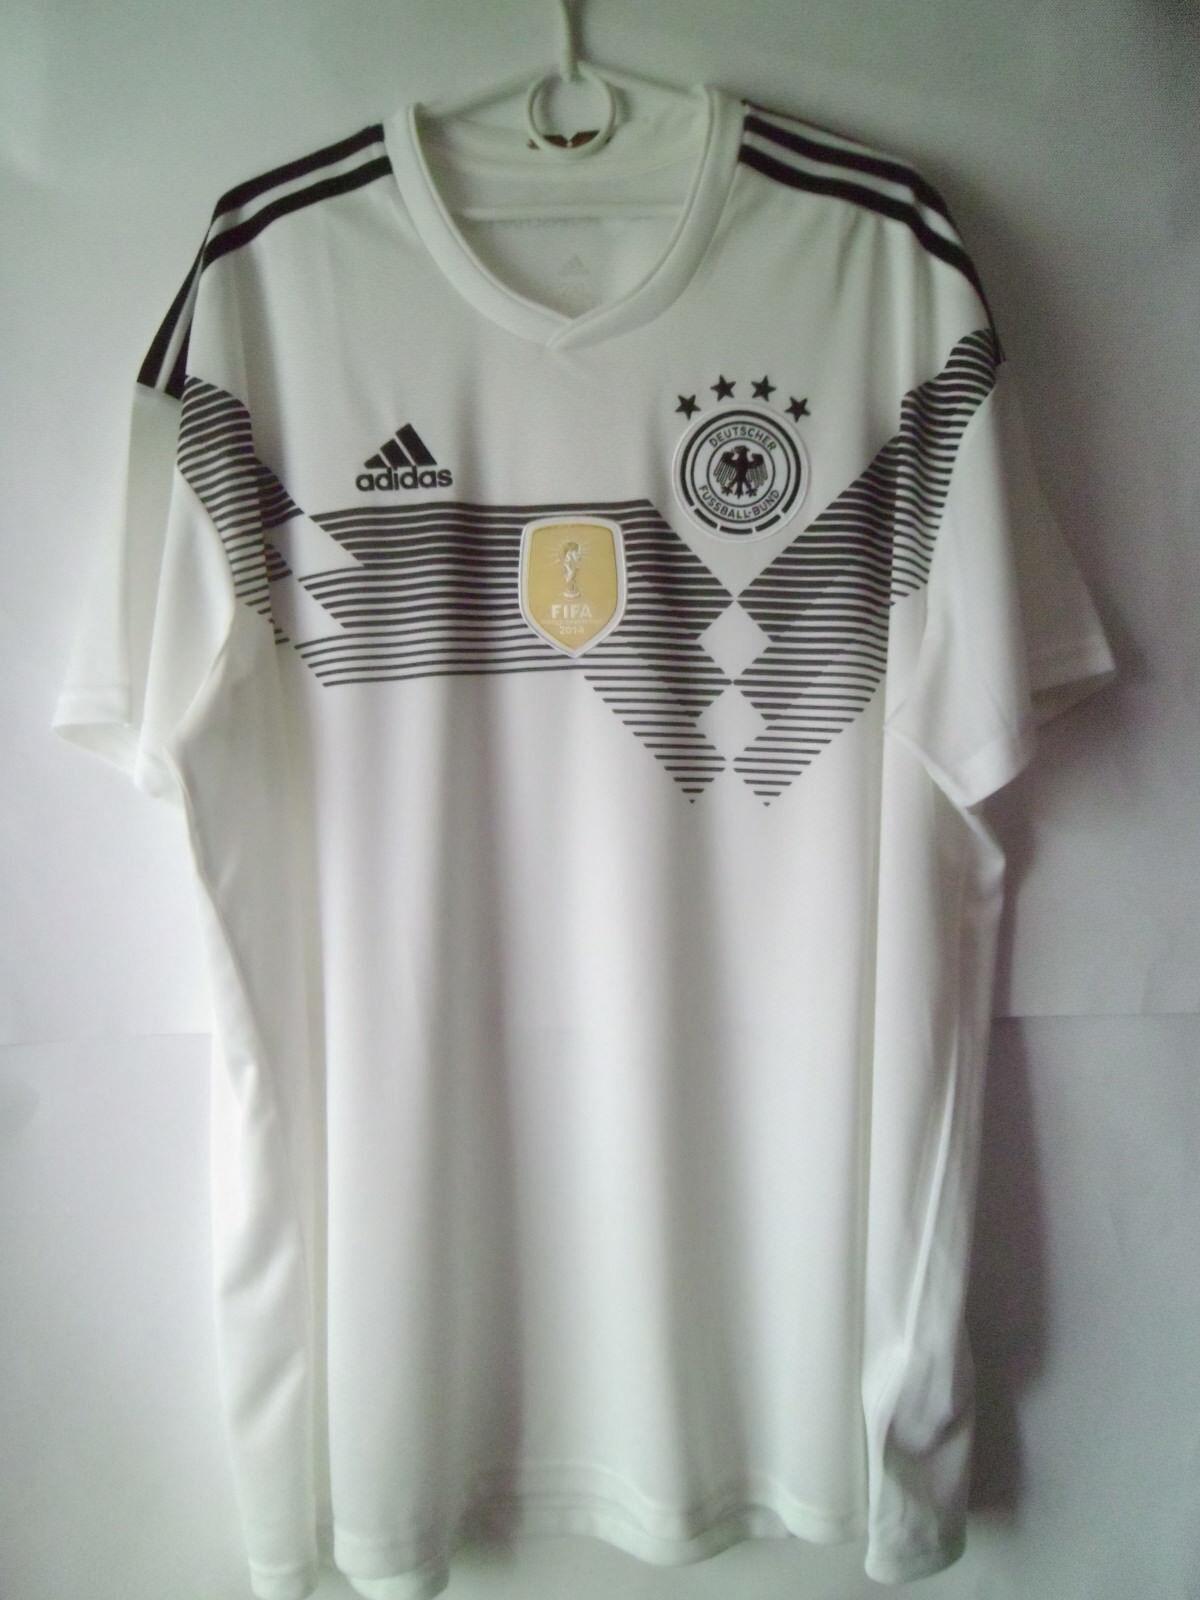 EXCELLENT    2018 Germany Home Shirt Jersey Trikot XXL 2XL  | Der Schatz des Kindes, unser Glück